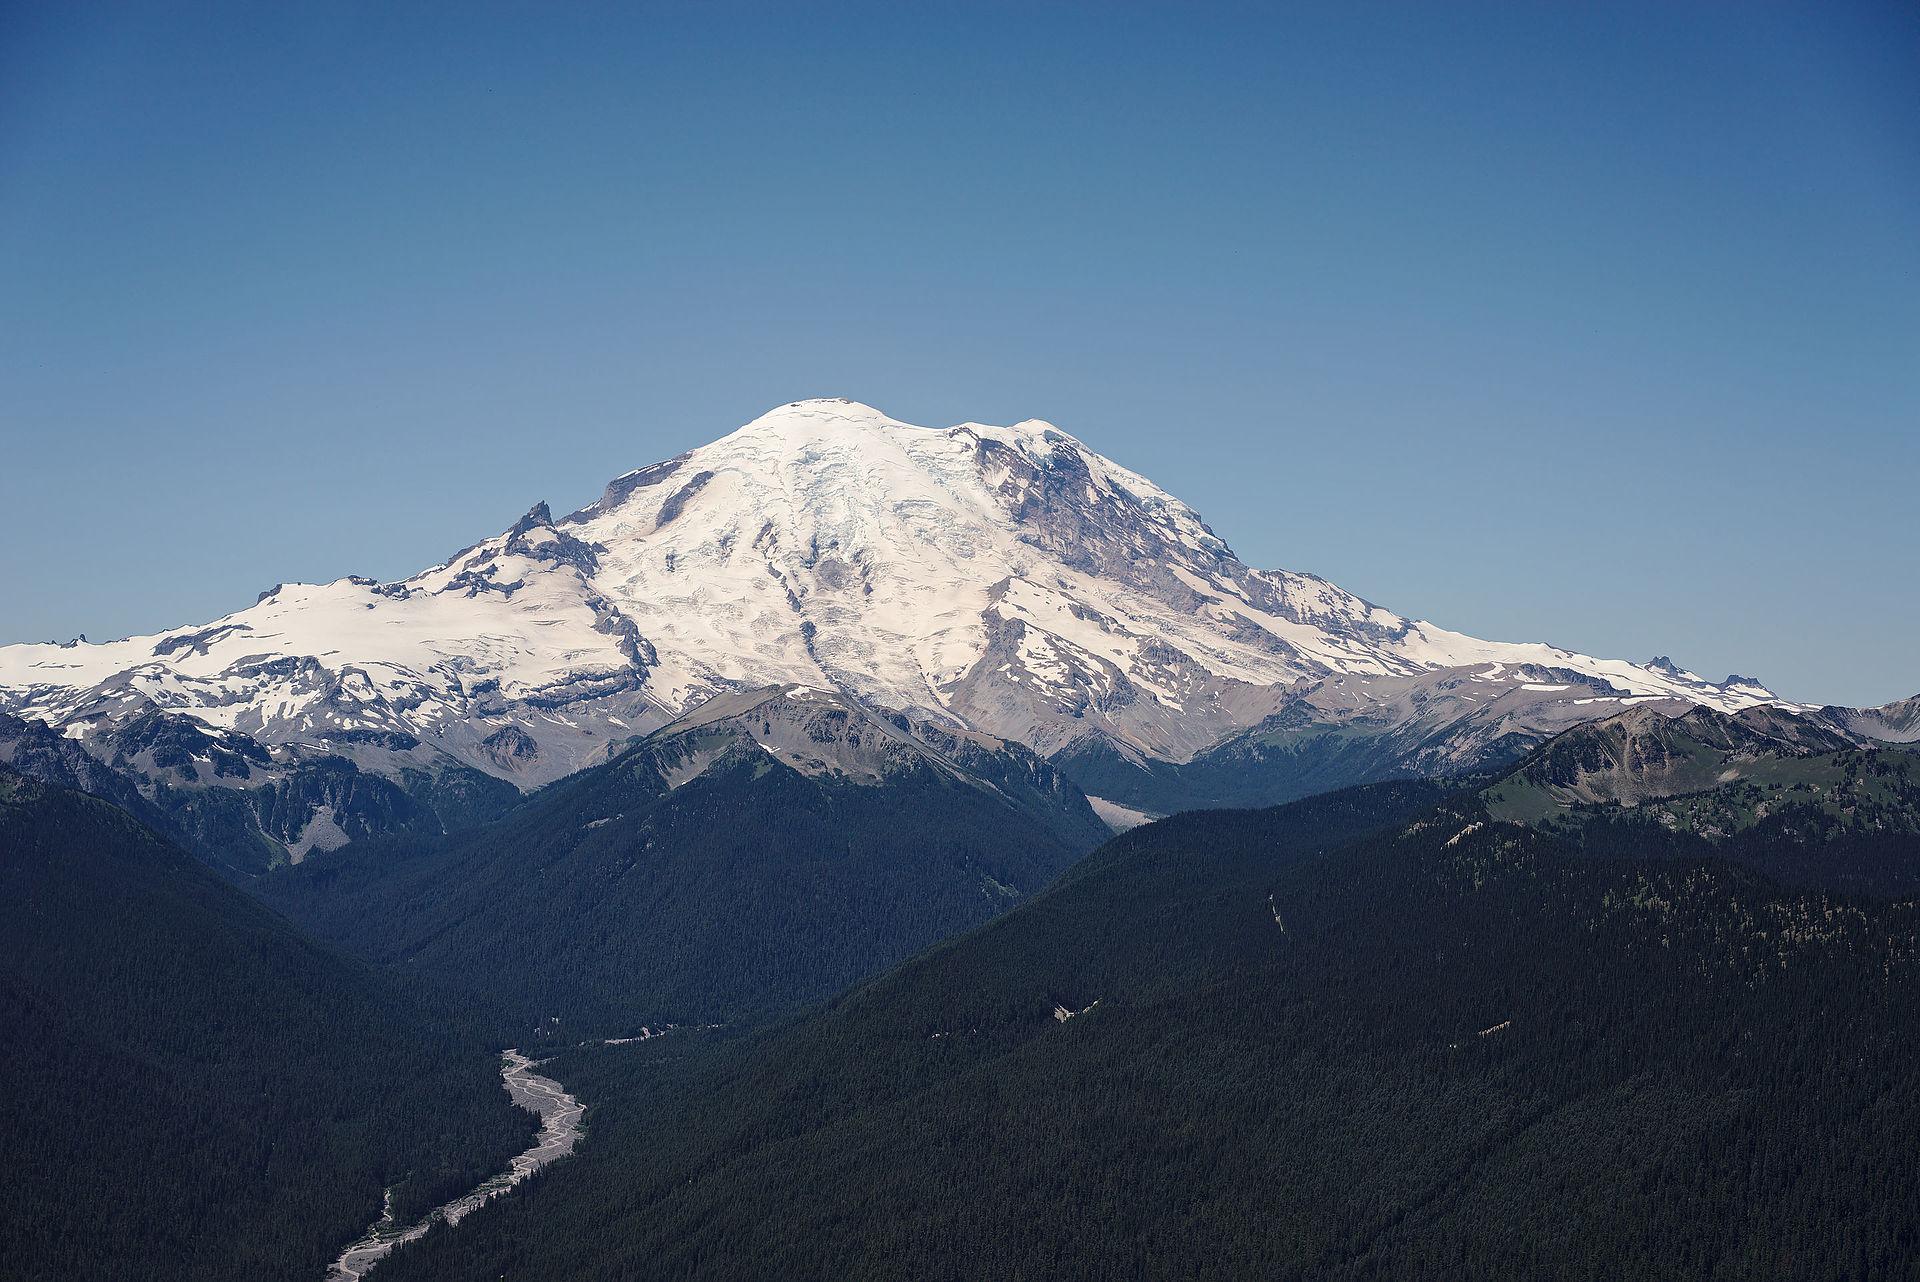 Mount_Rainier_from_the_Silver_Queen_Peak